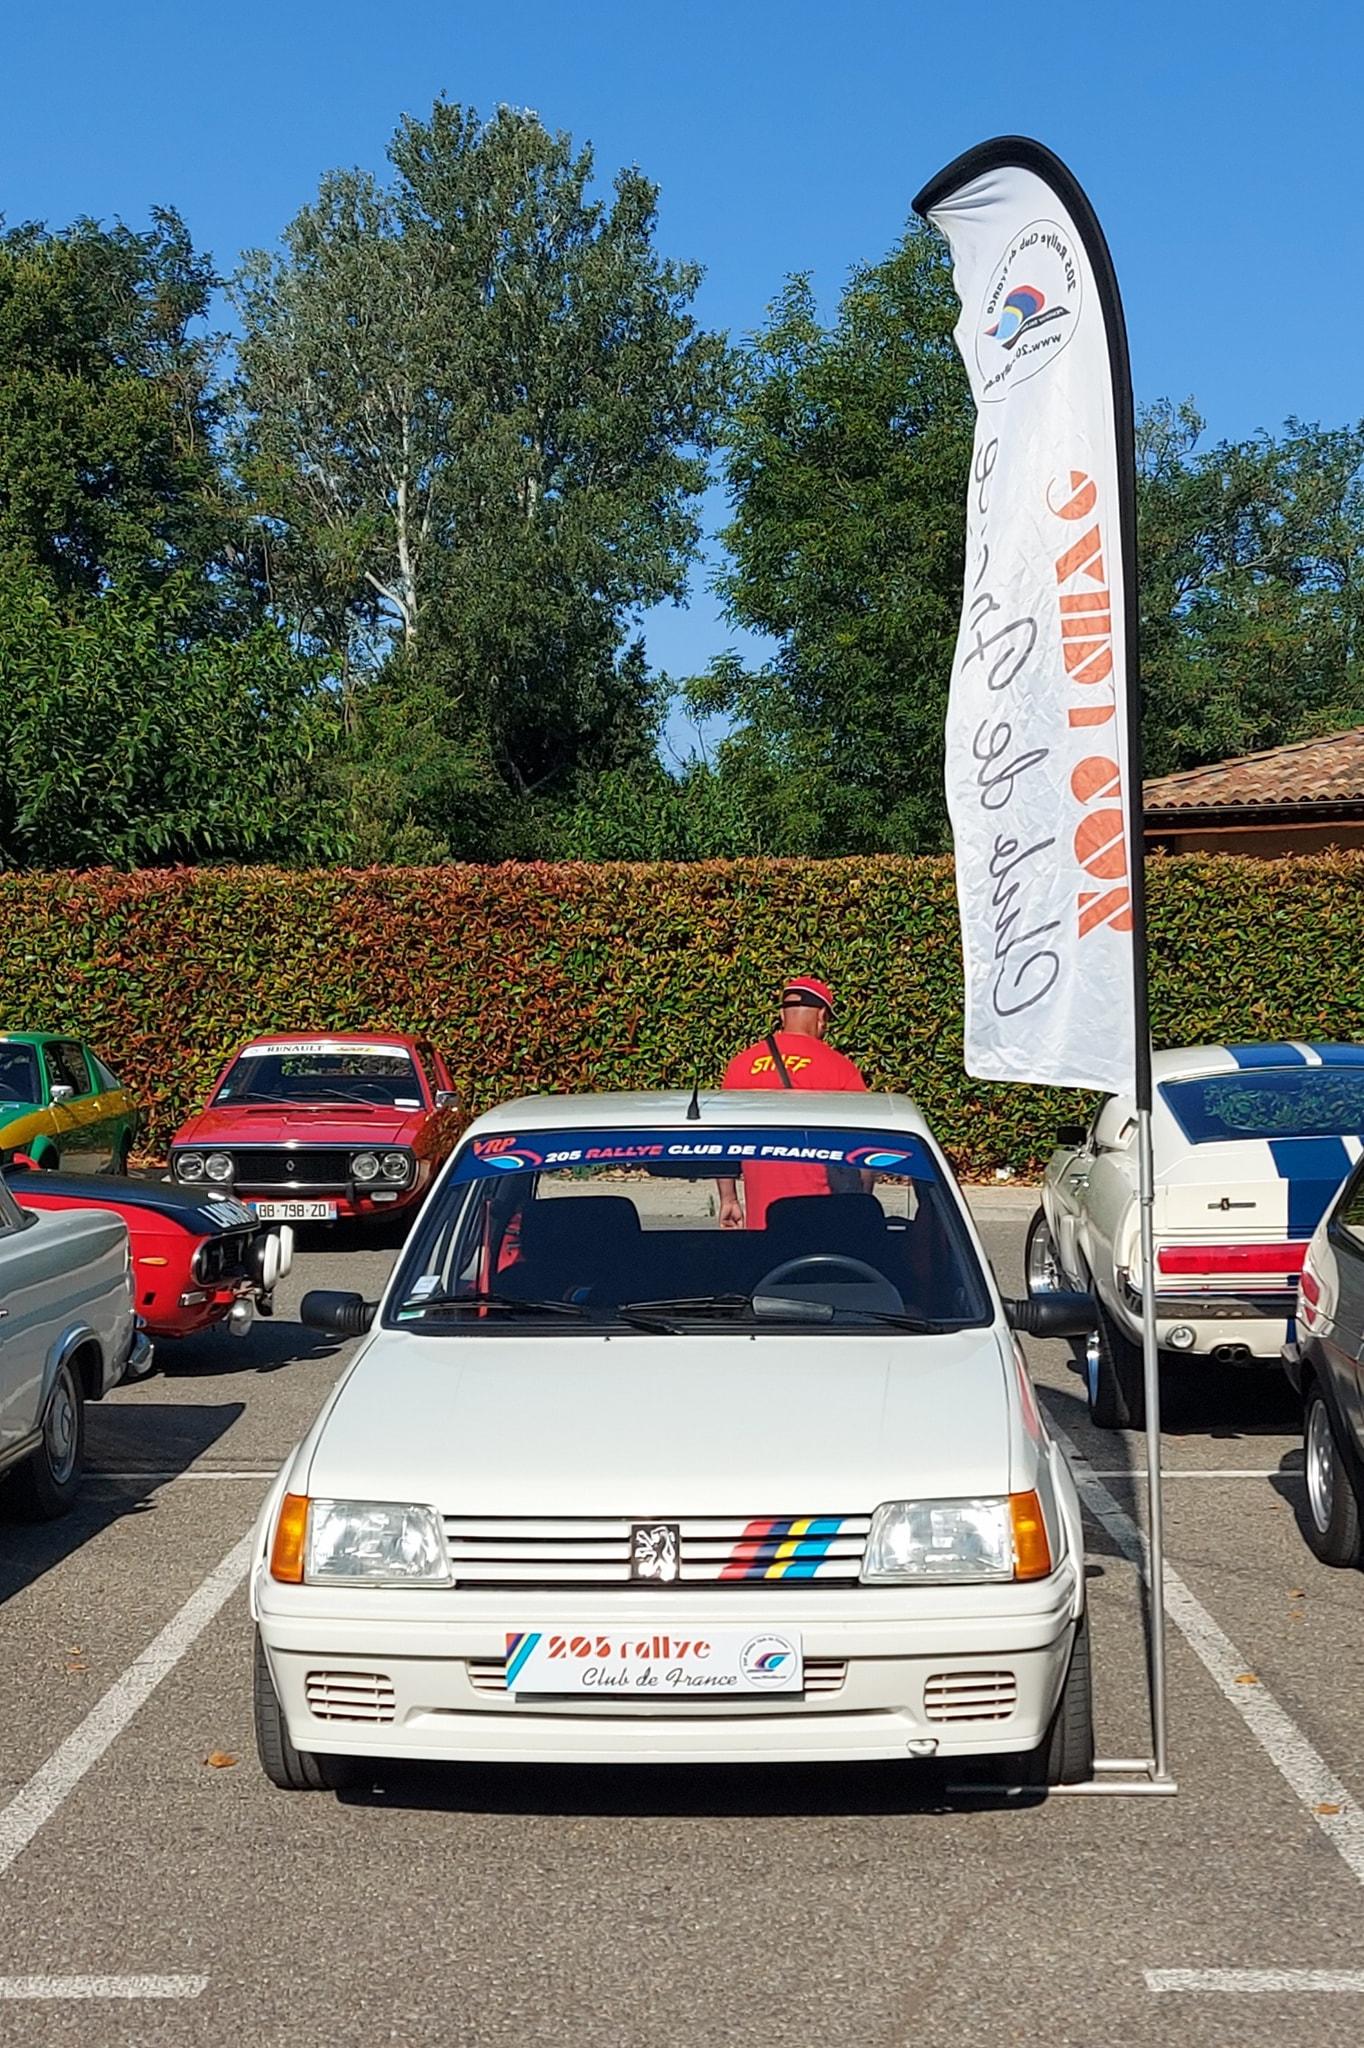 [jean-luc13] 205 Rallye Blanc Meije 1989 - Page 29 21984010